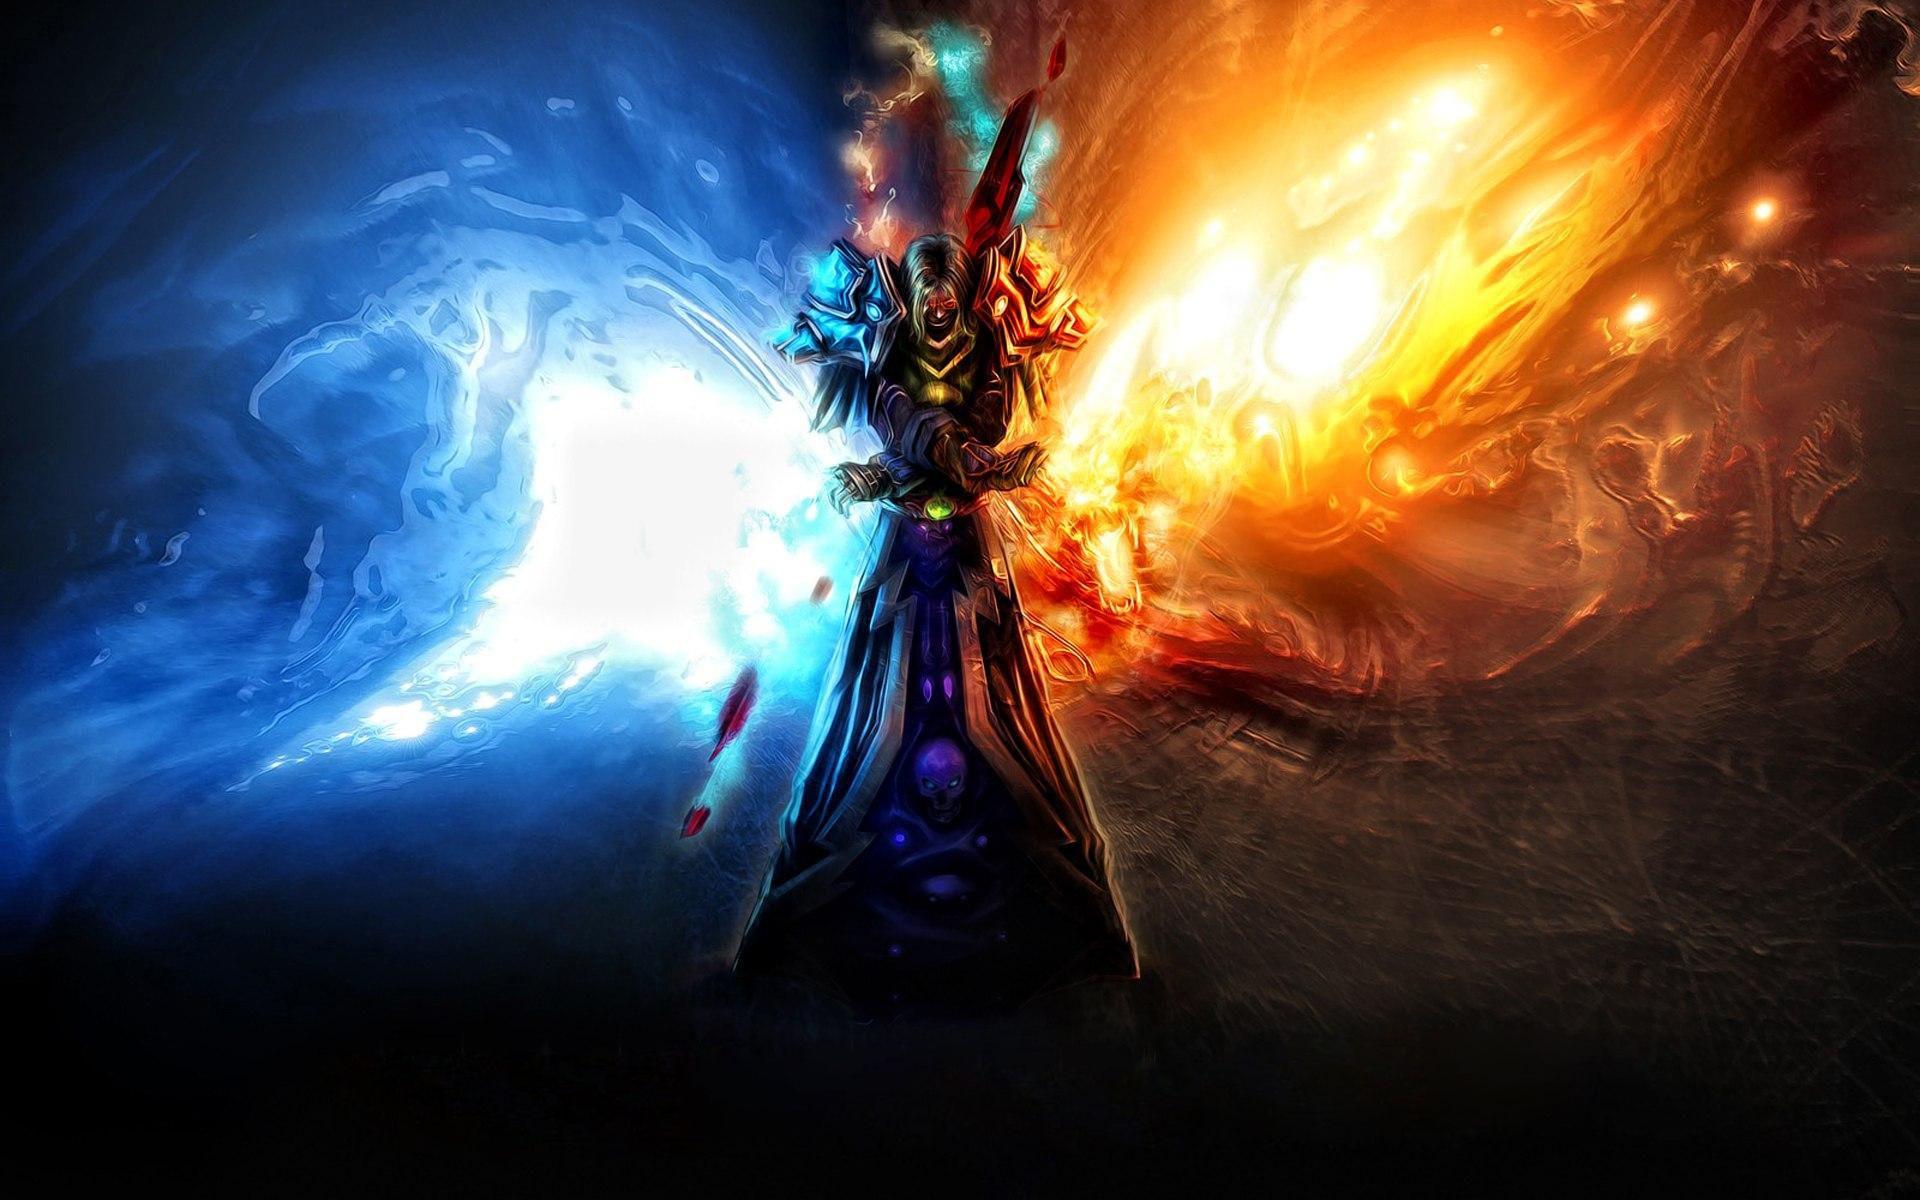 World Warcraft Desktop Free wallpaper download 1920×1080